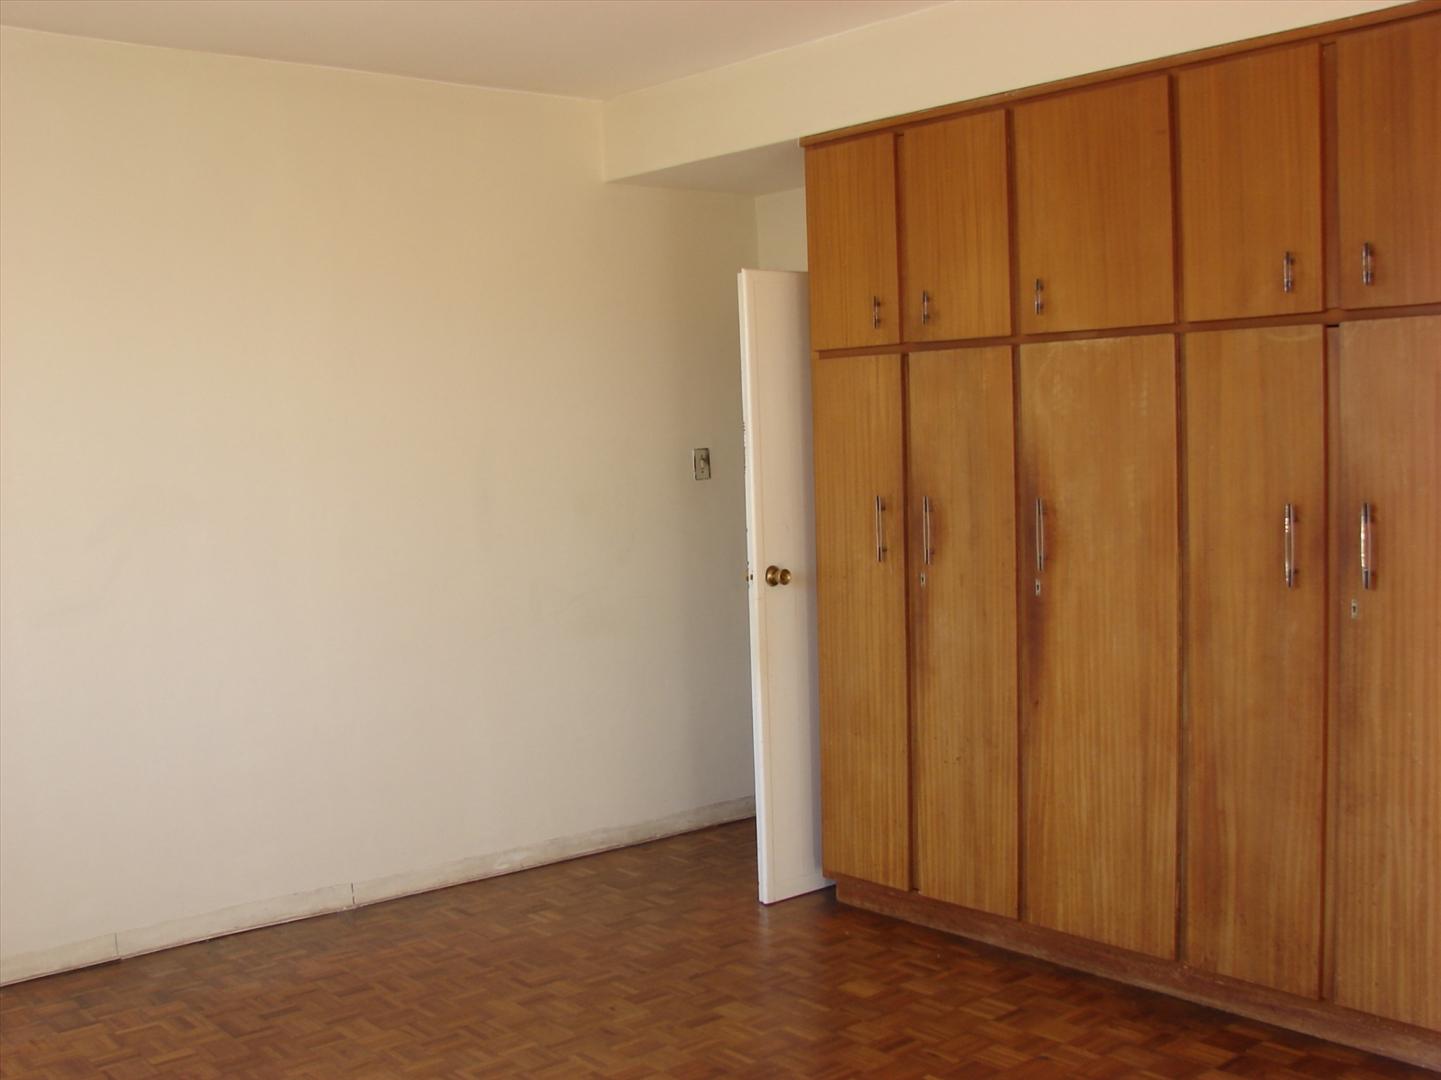 Apartment Rental Monthly in Port Elizabeth